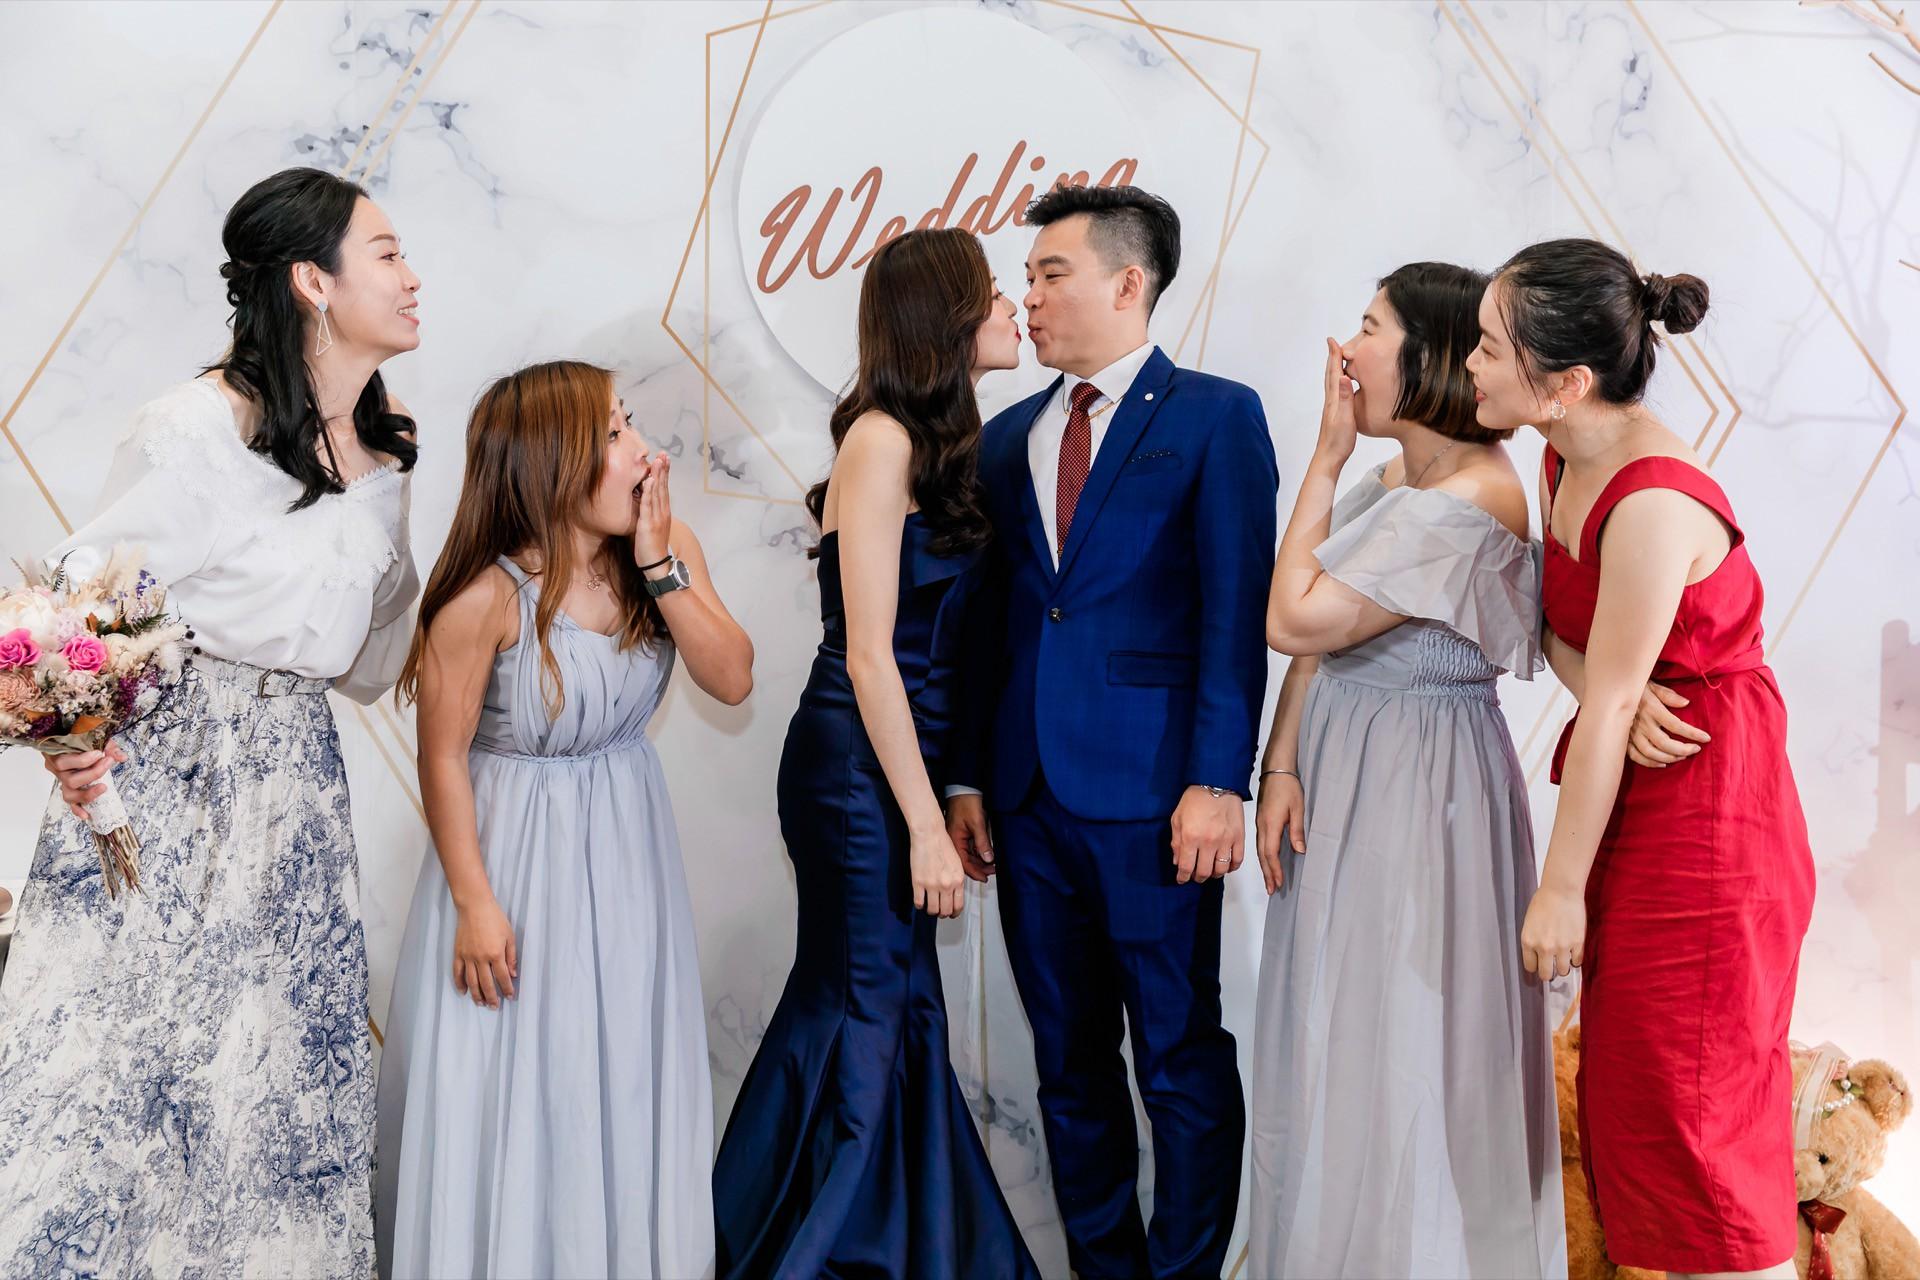 Wedding-393